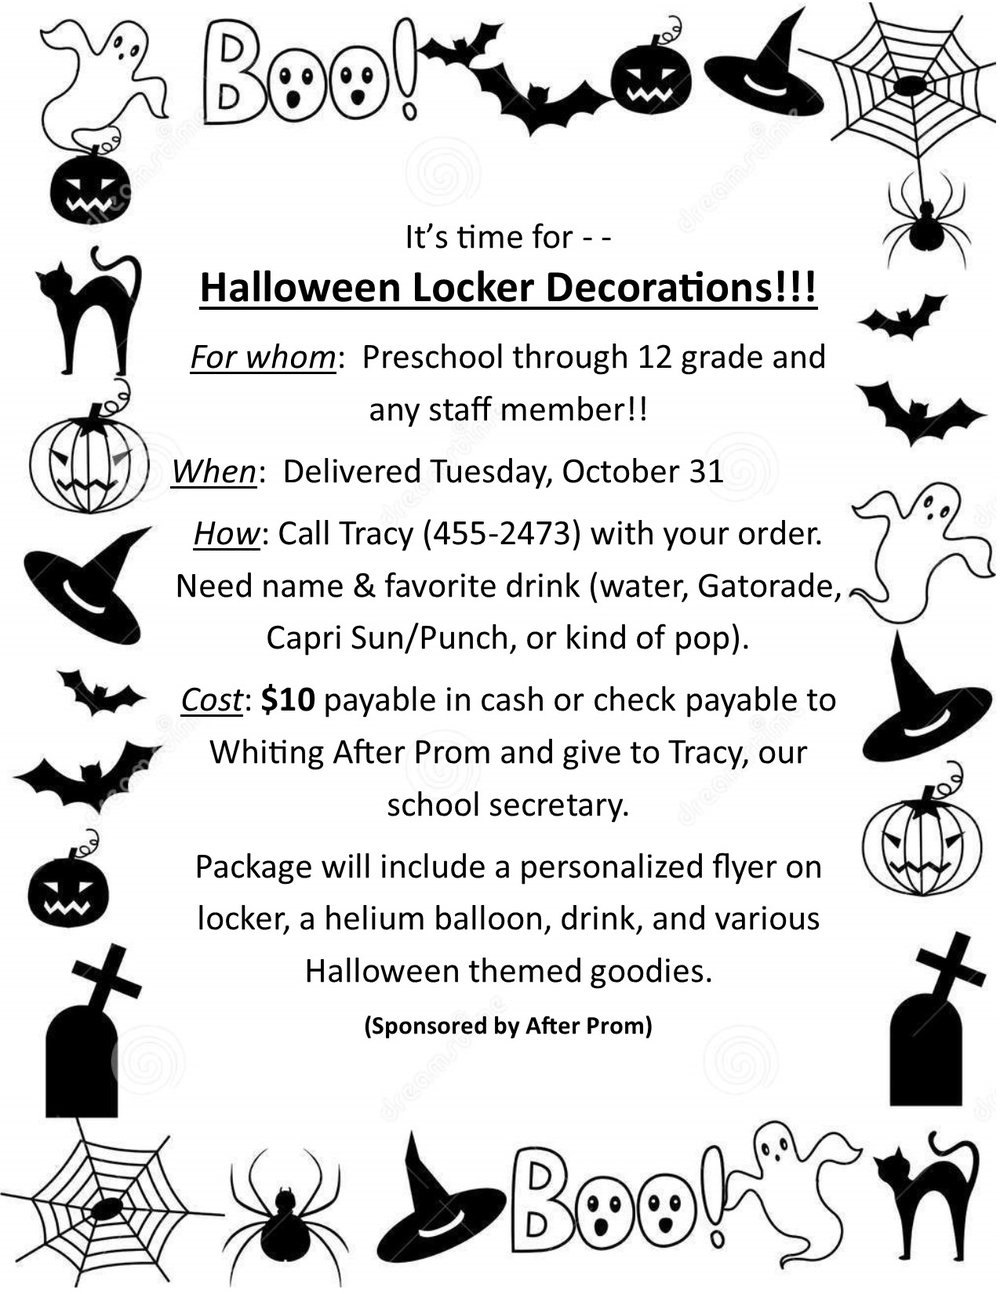 Halloween Locker Decoration Flyer 2017